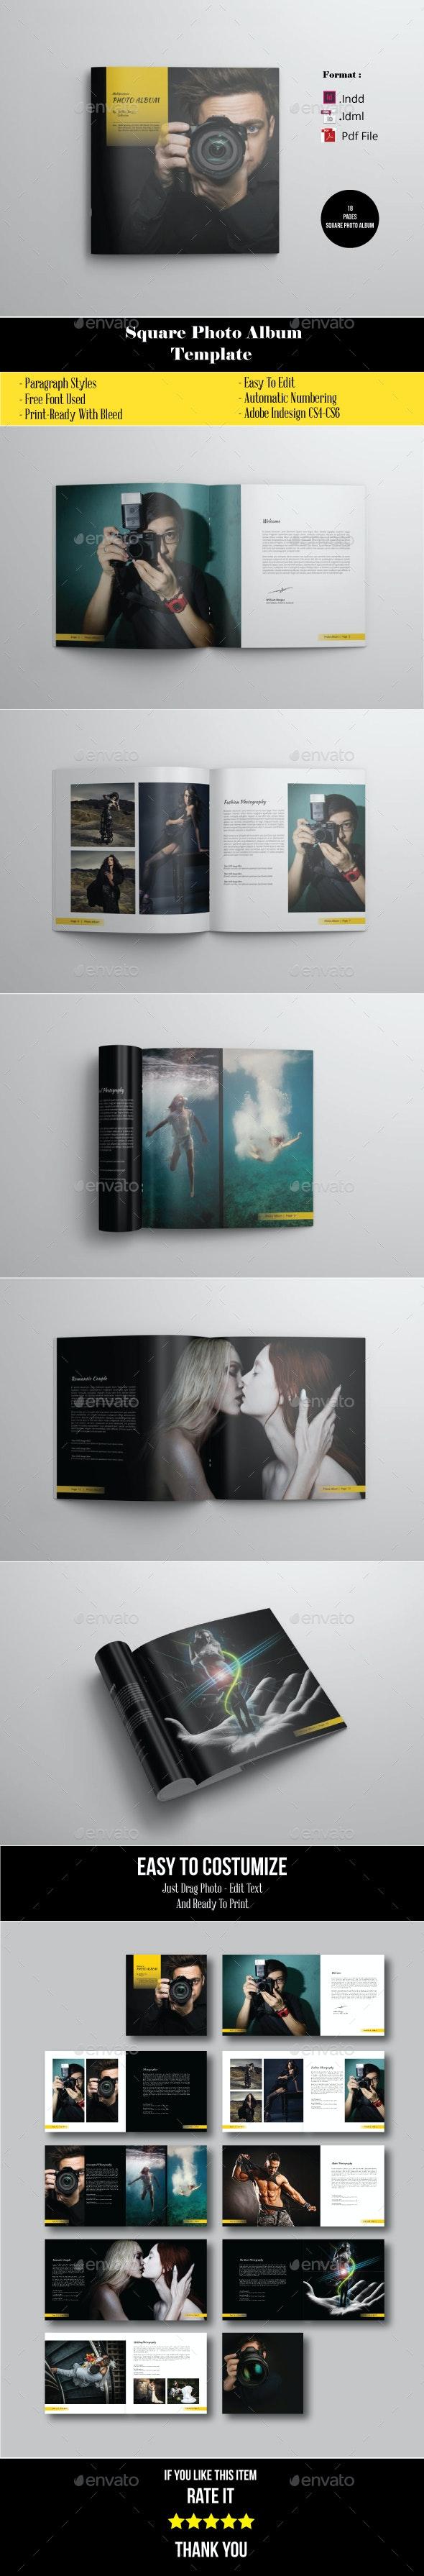 18 Pages Square Photo Album Portofolio Photographer - Photo Albums Print Templates